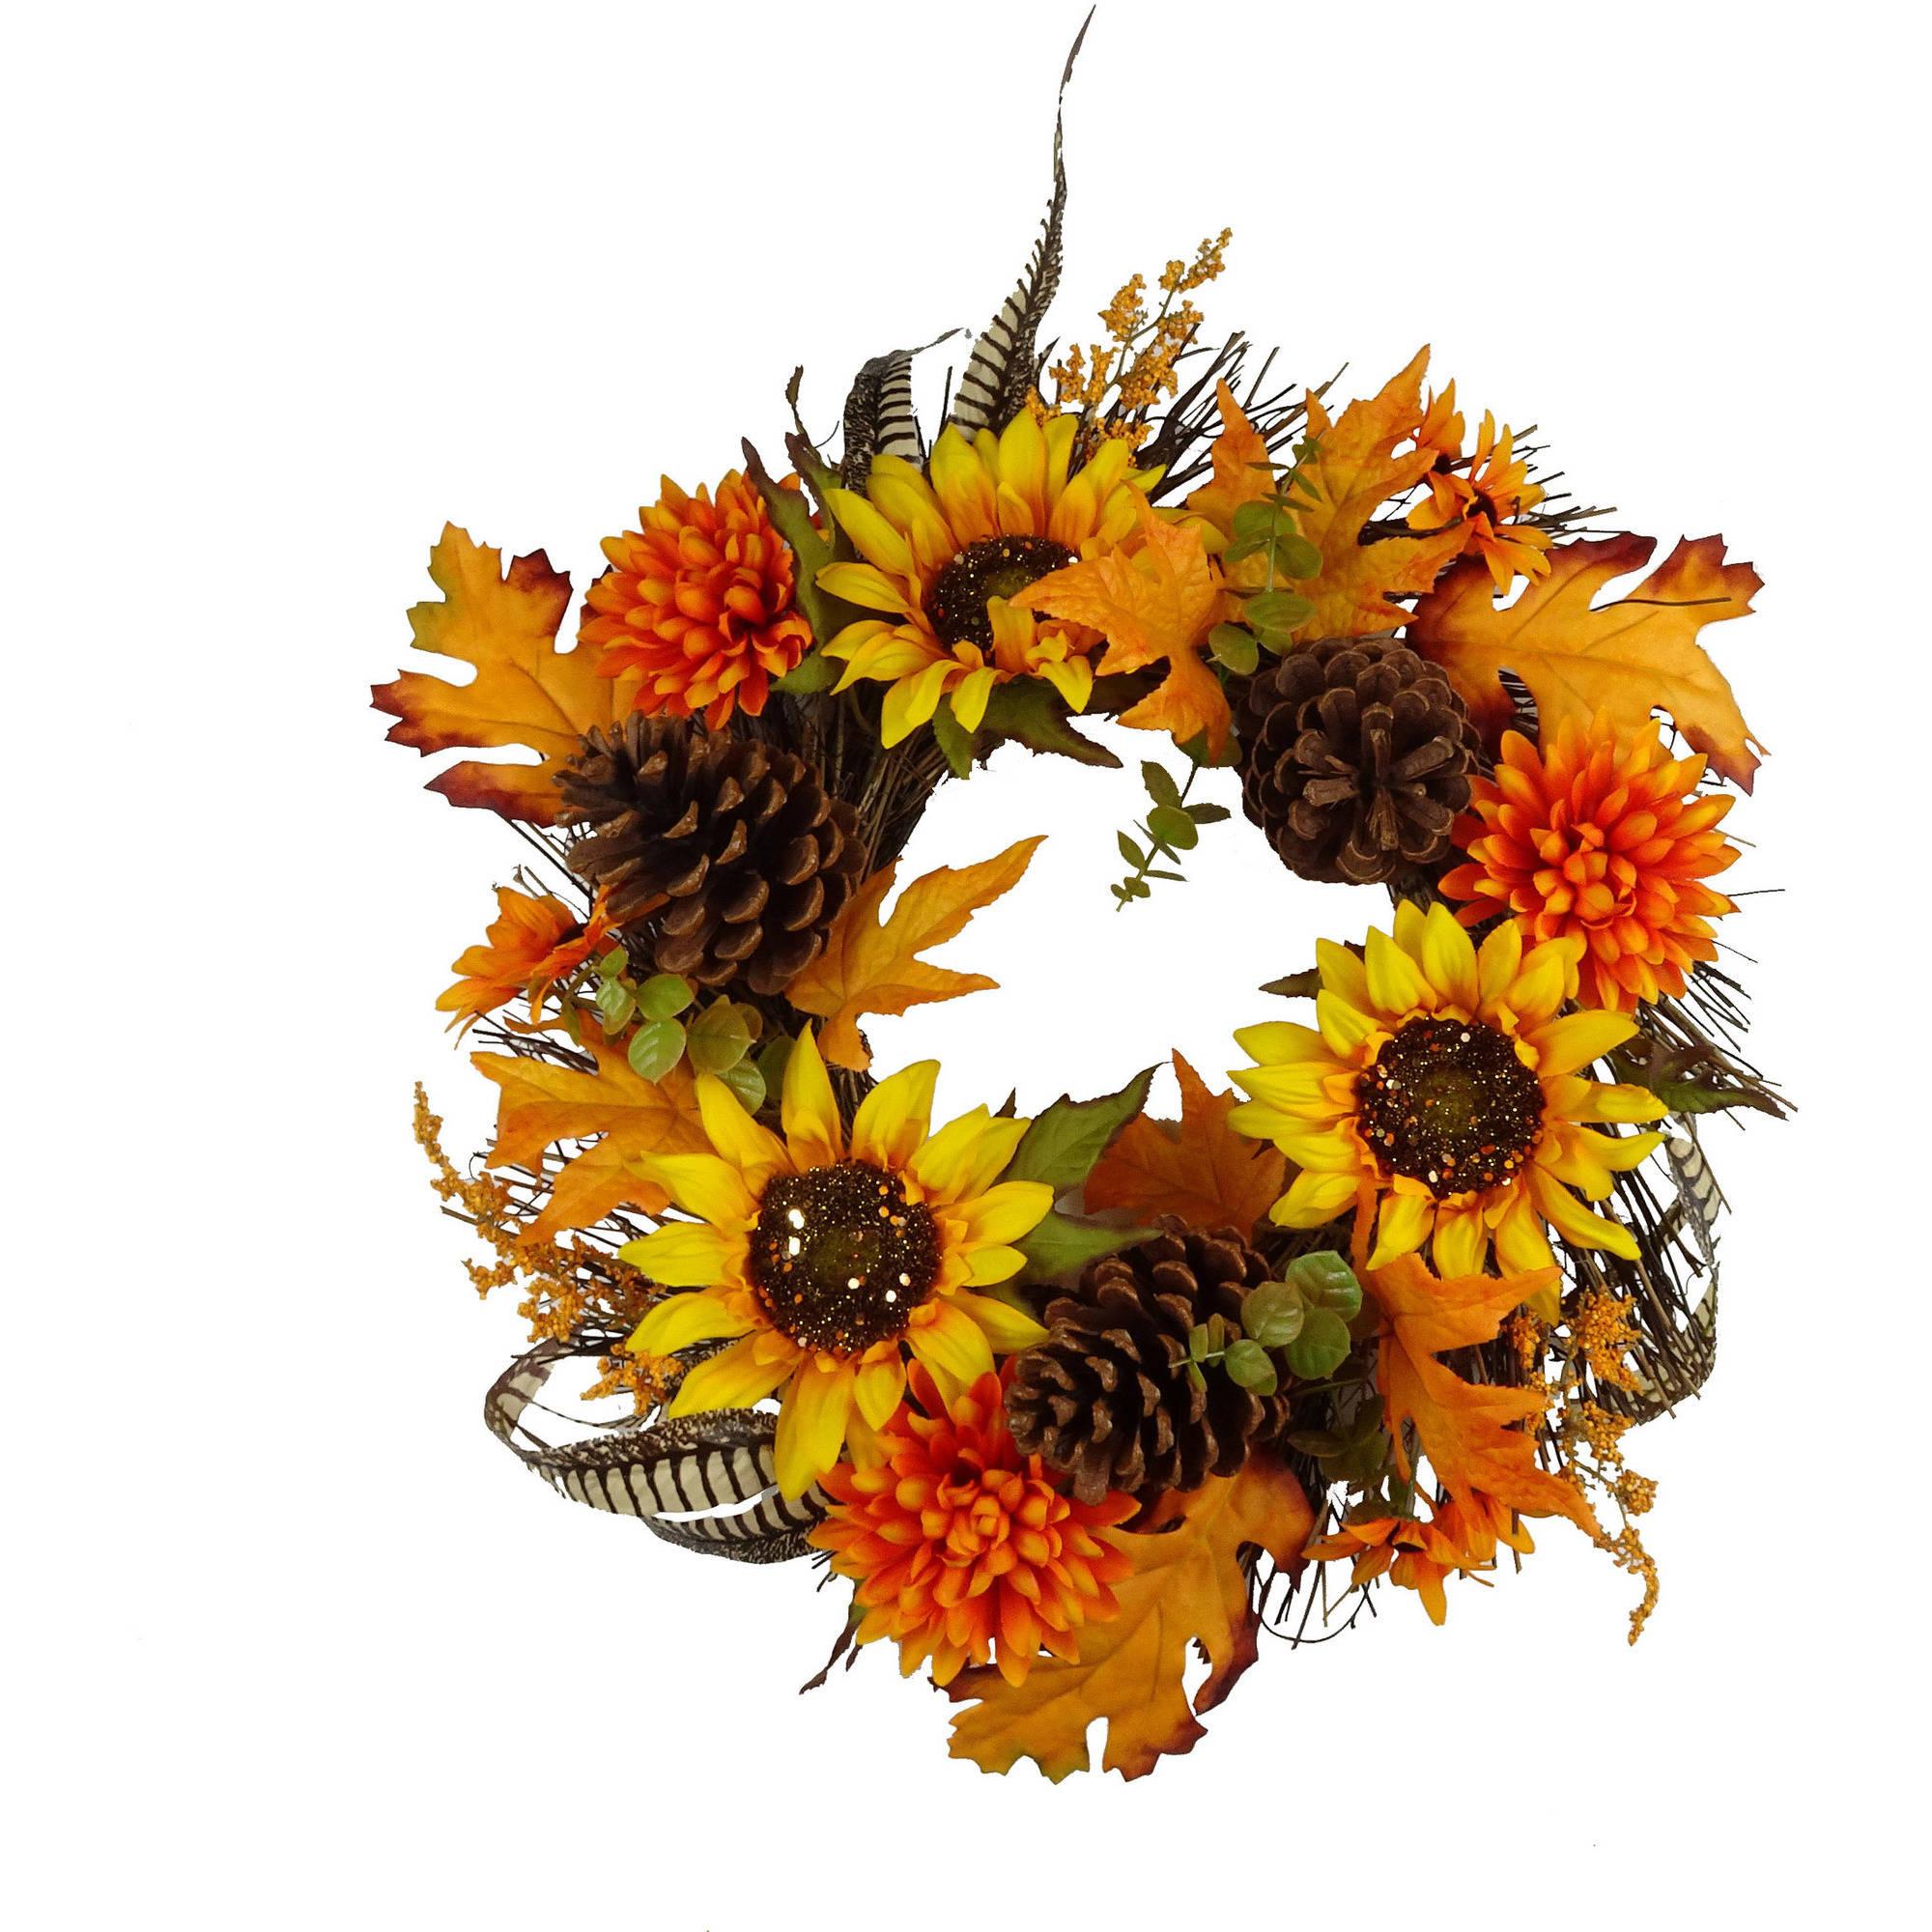 Walmart Halloween Yellow Sunflower Mixed Wreath Harvest Fall Decor Fall Harvest Halloween Decoration